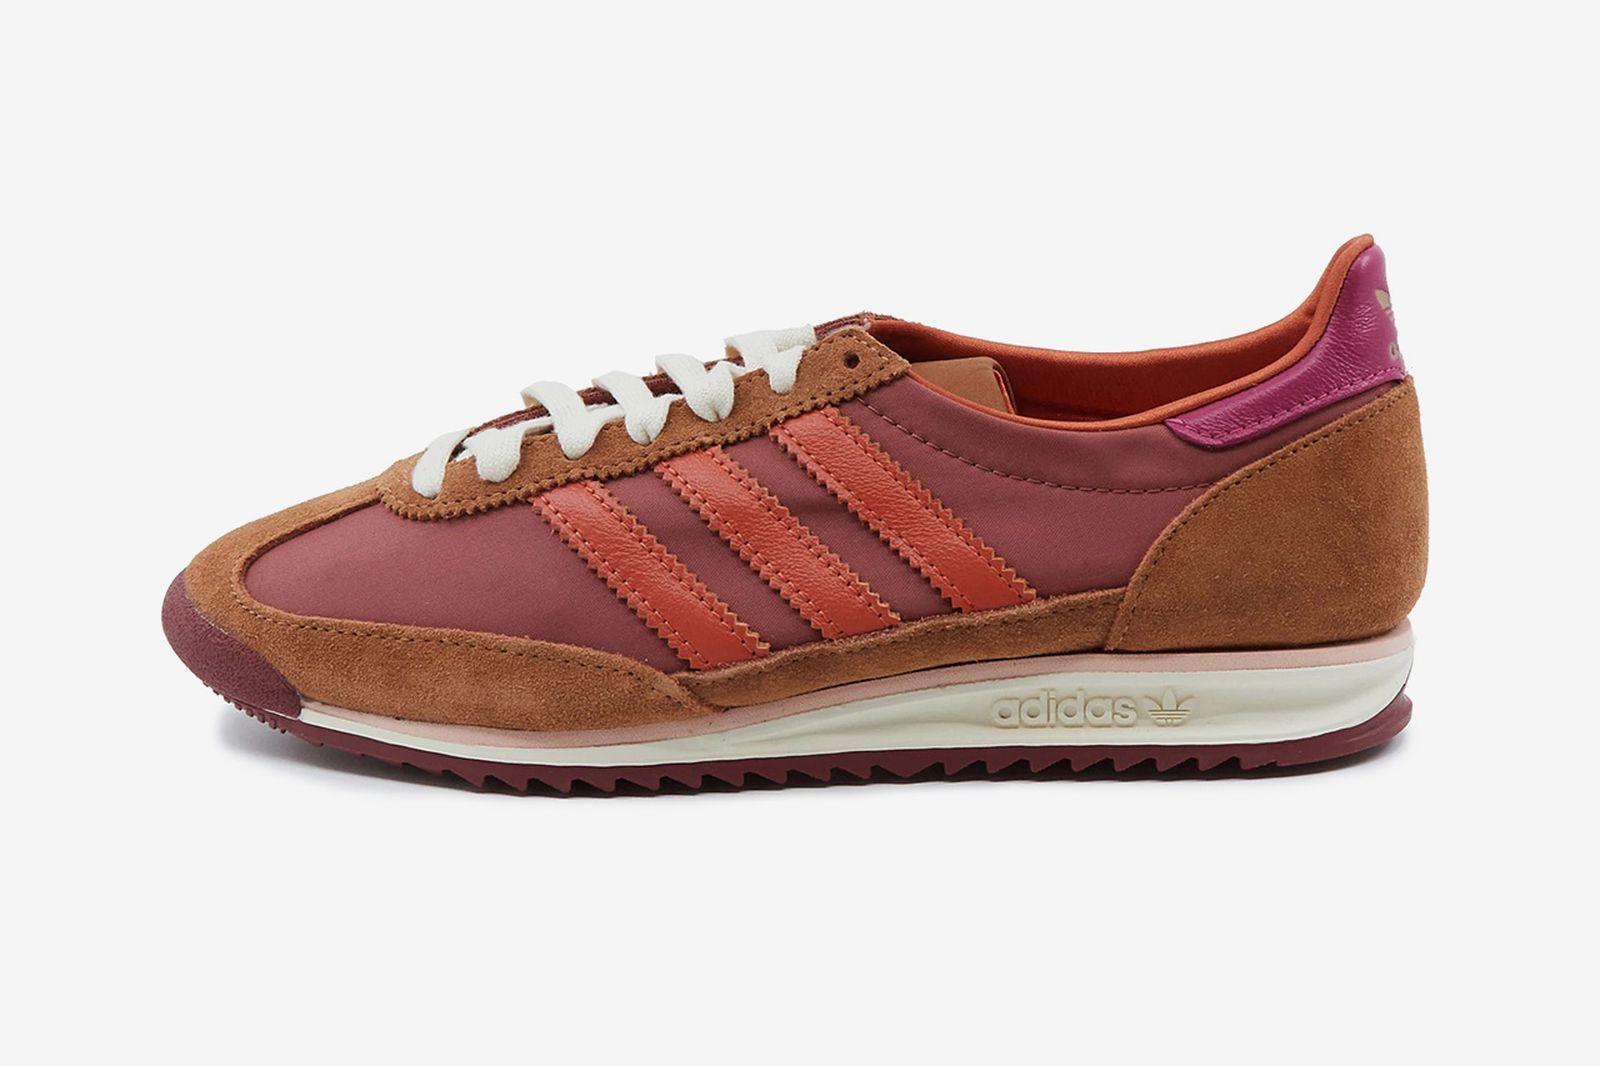 wales-bonner-adidas-originals-samba-release-date-price-03